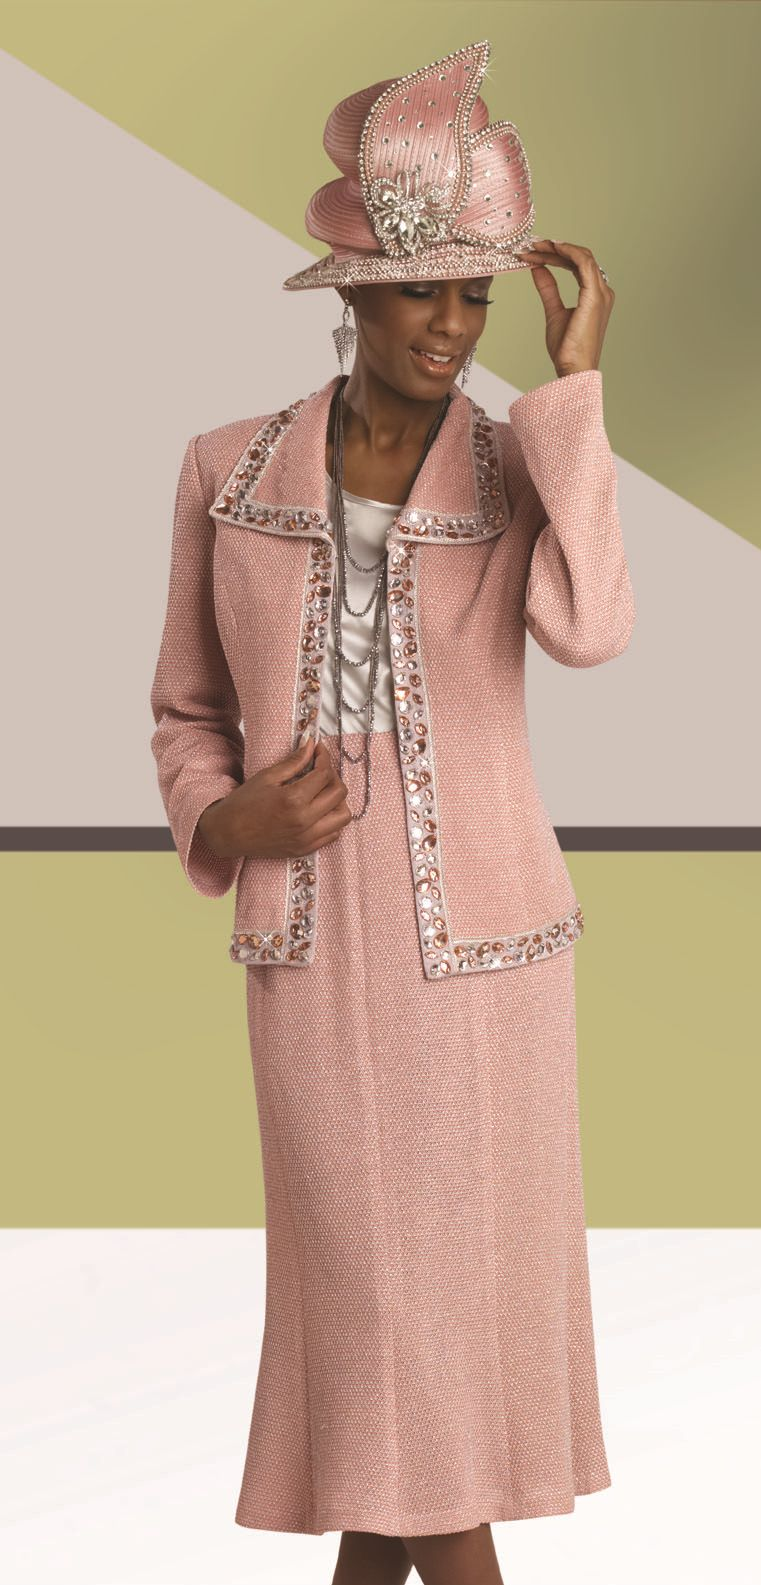 Donna Vinci Knits : Donna Vinci Knits 13054 Womens 3pc Church Suit - French Novelty